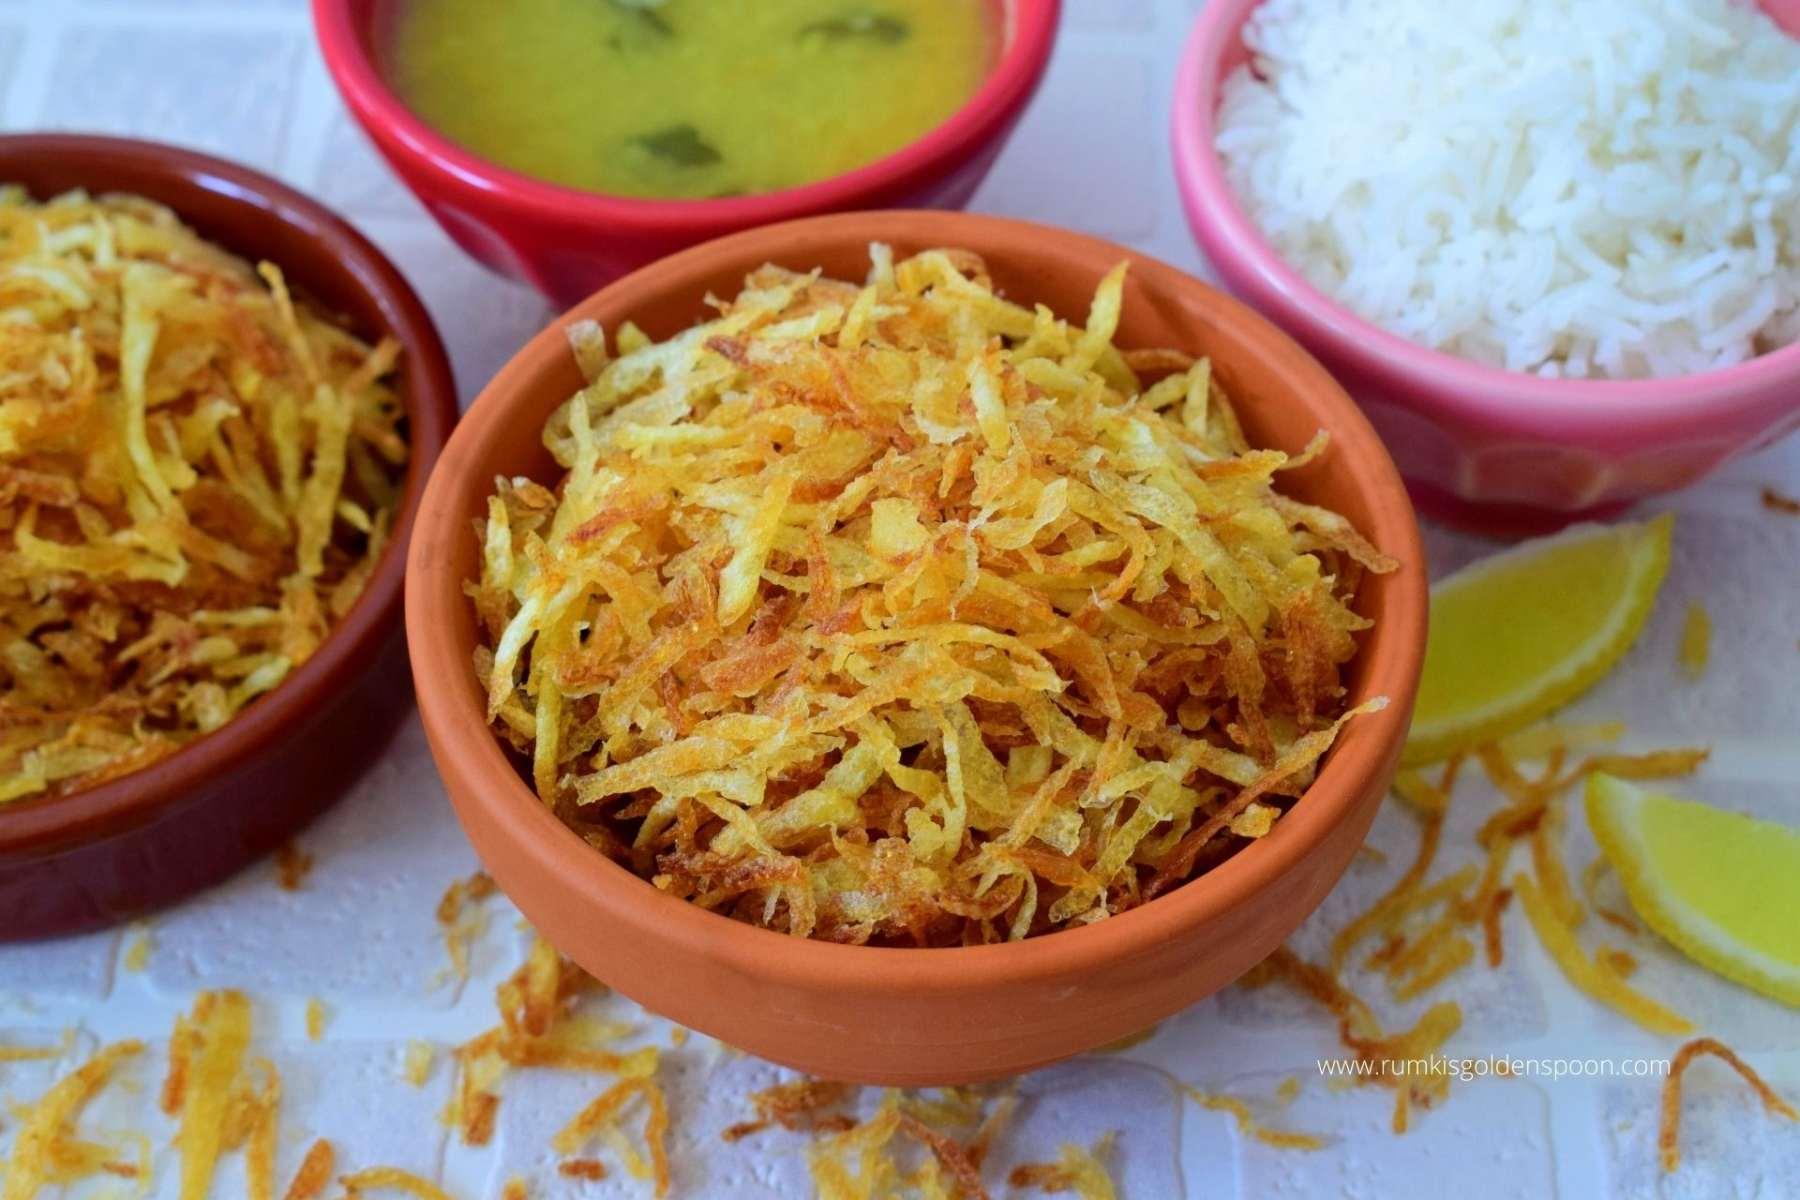 Jhuri Aloo Bhaja   Crispy potato fry   How to make jhuri aloo bhaja - Rumki's Golden Spoon